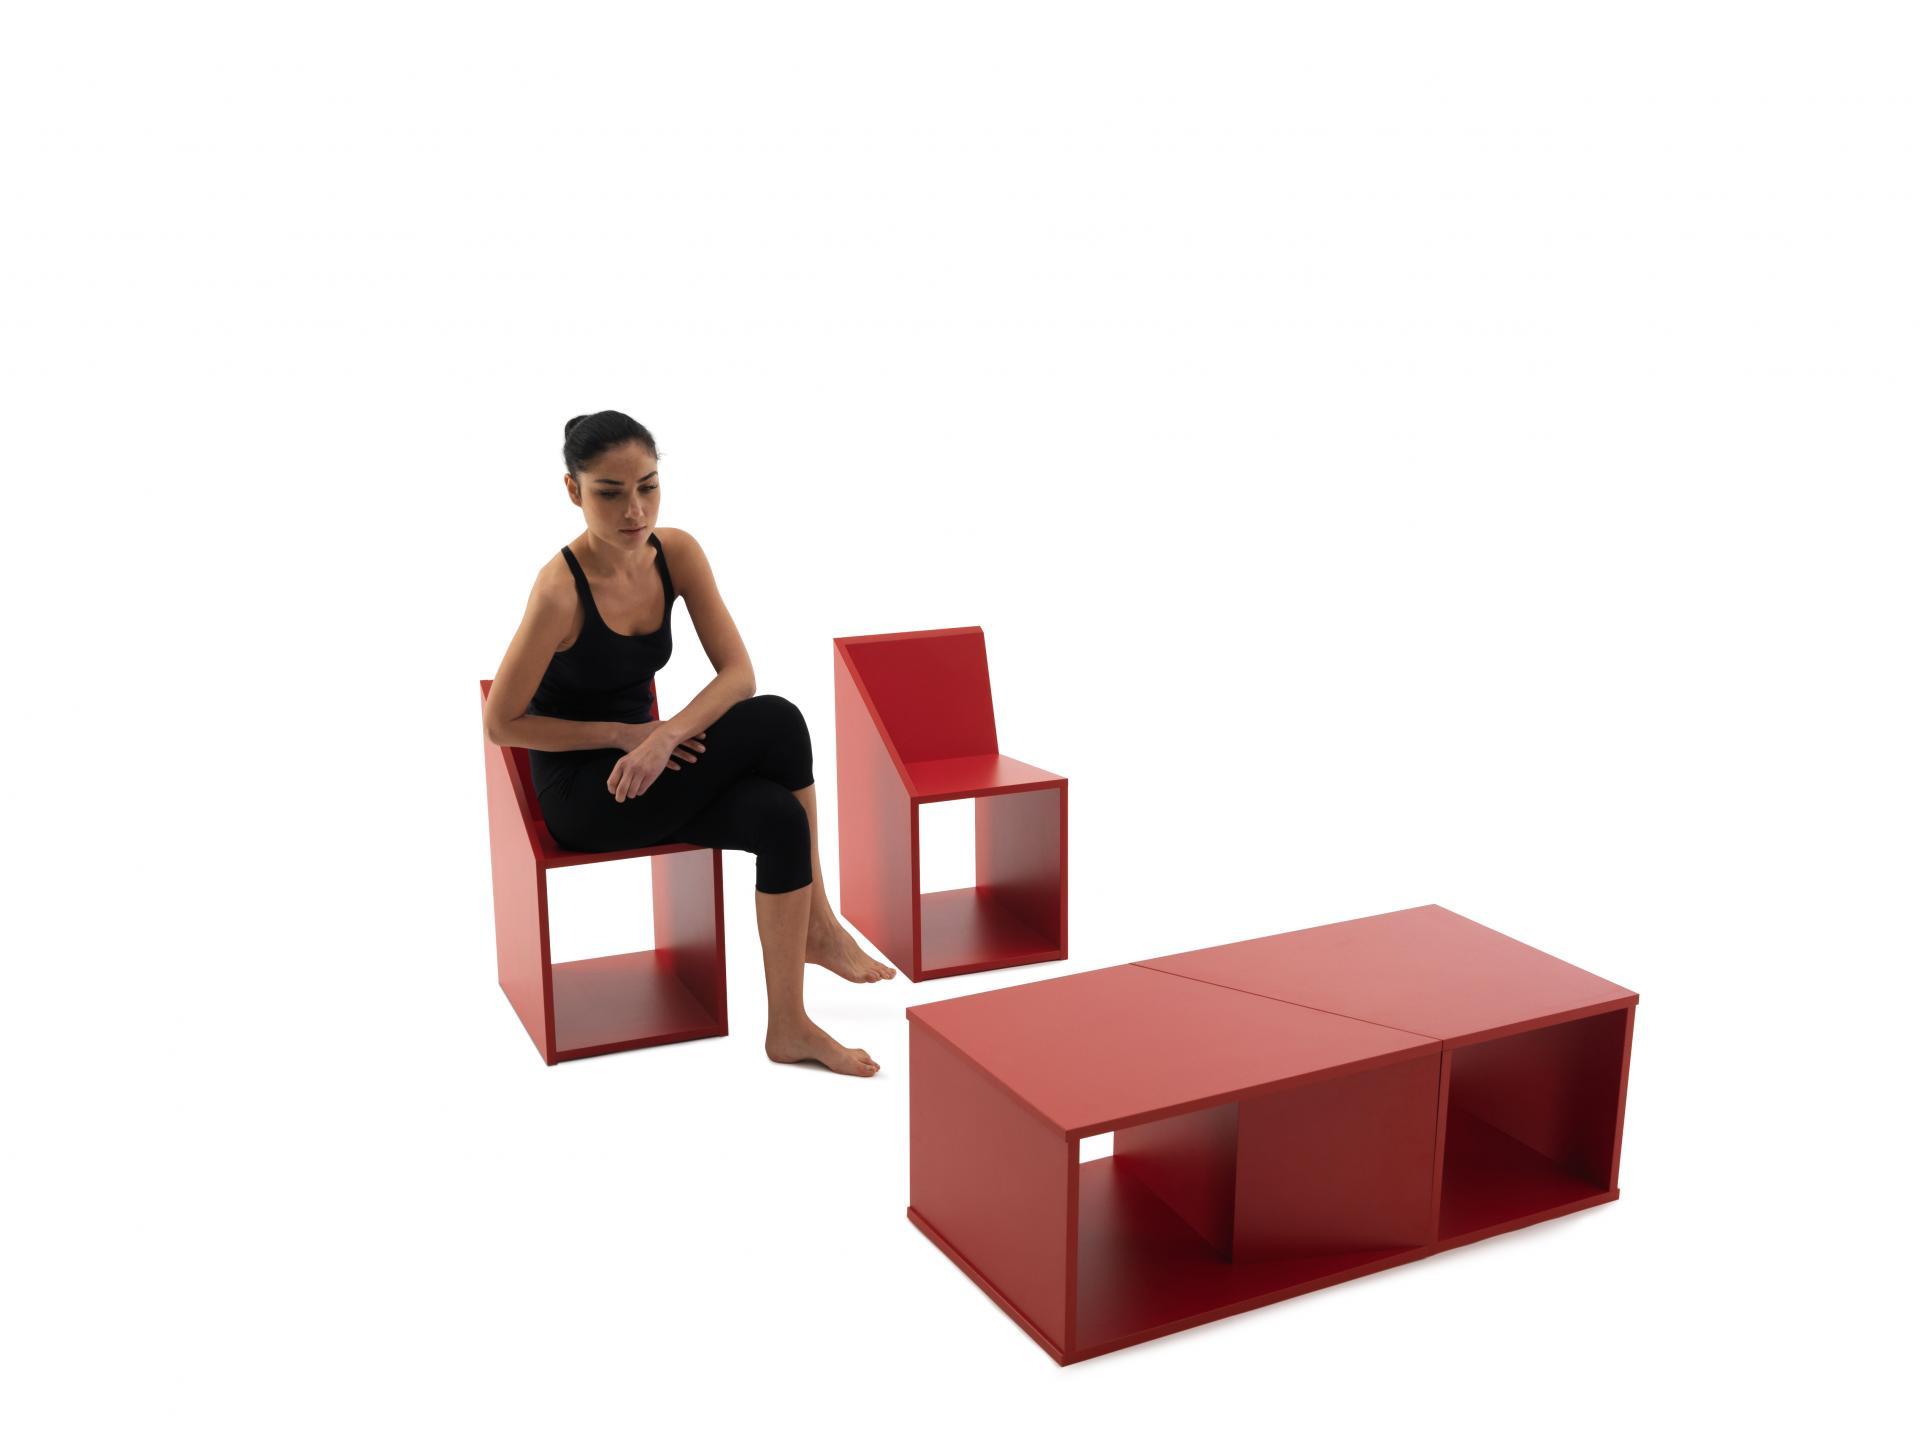 arredamento mobili trasformabili: showroom: letto matrimoniale a ... - Mobili Trasformabili Video